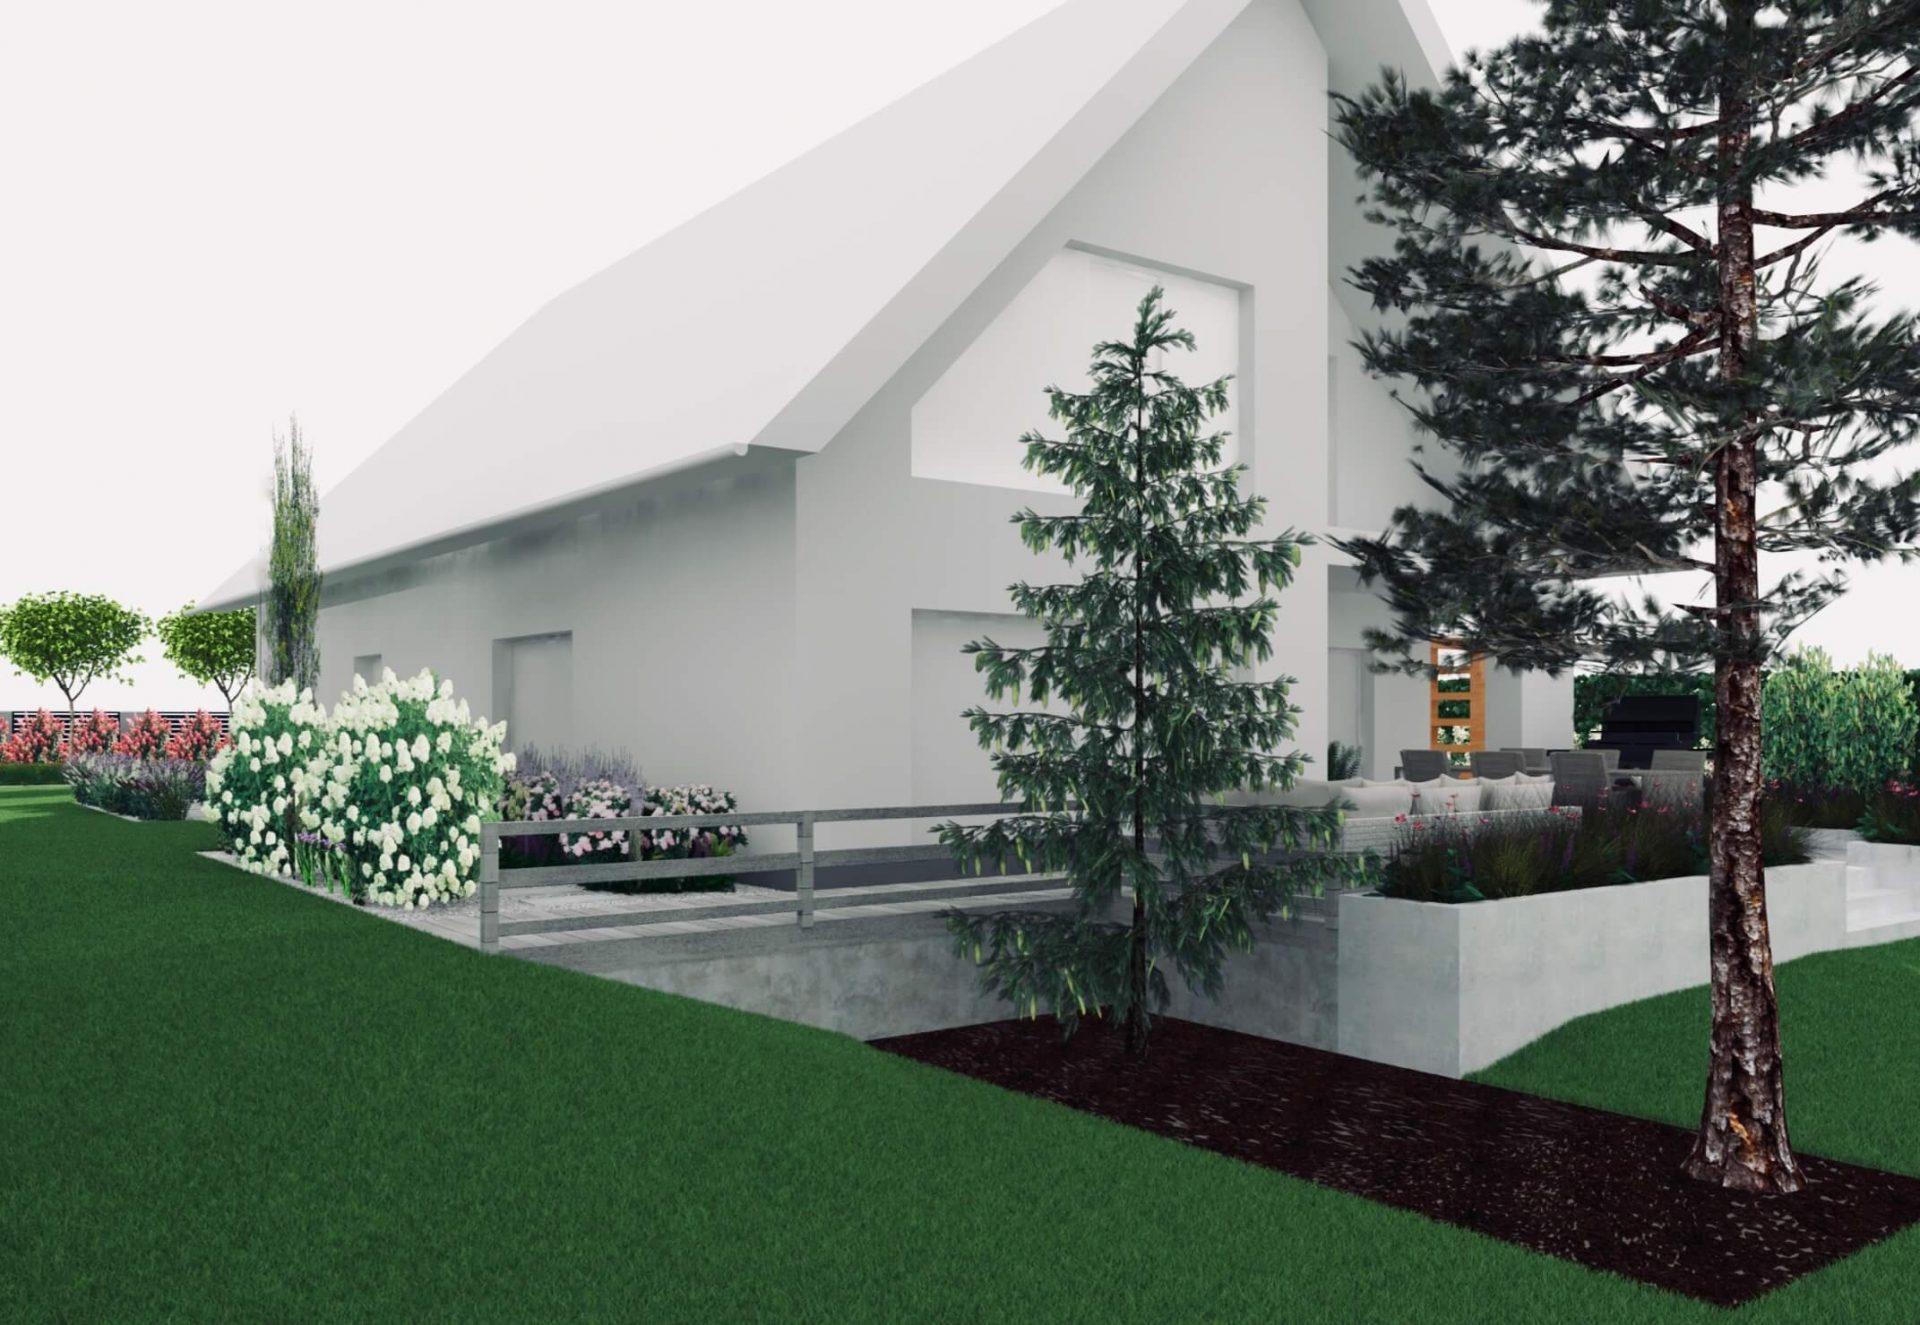 Projekt ogrodu taras na podwyższeniu